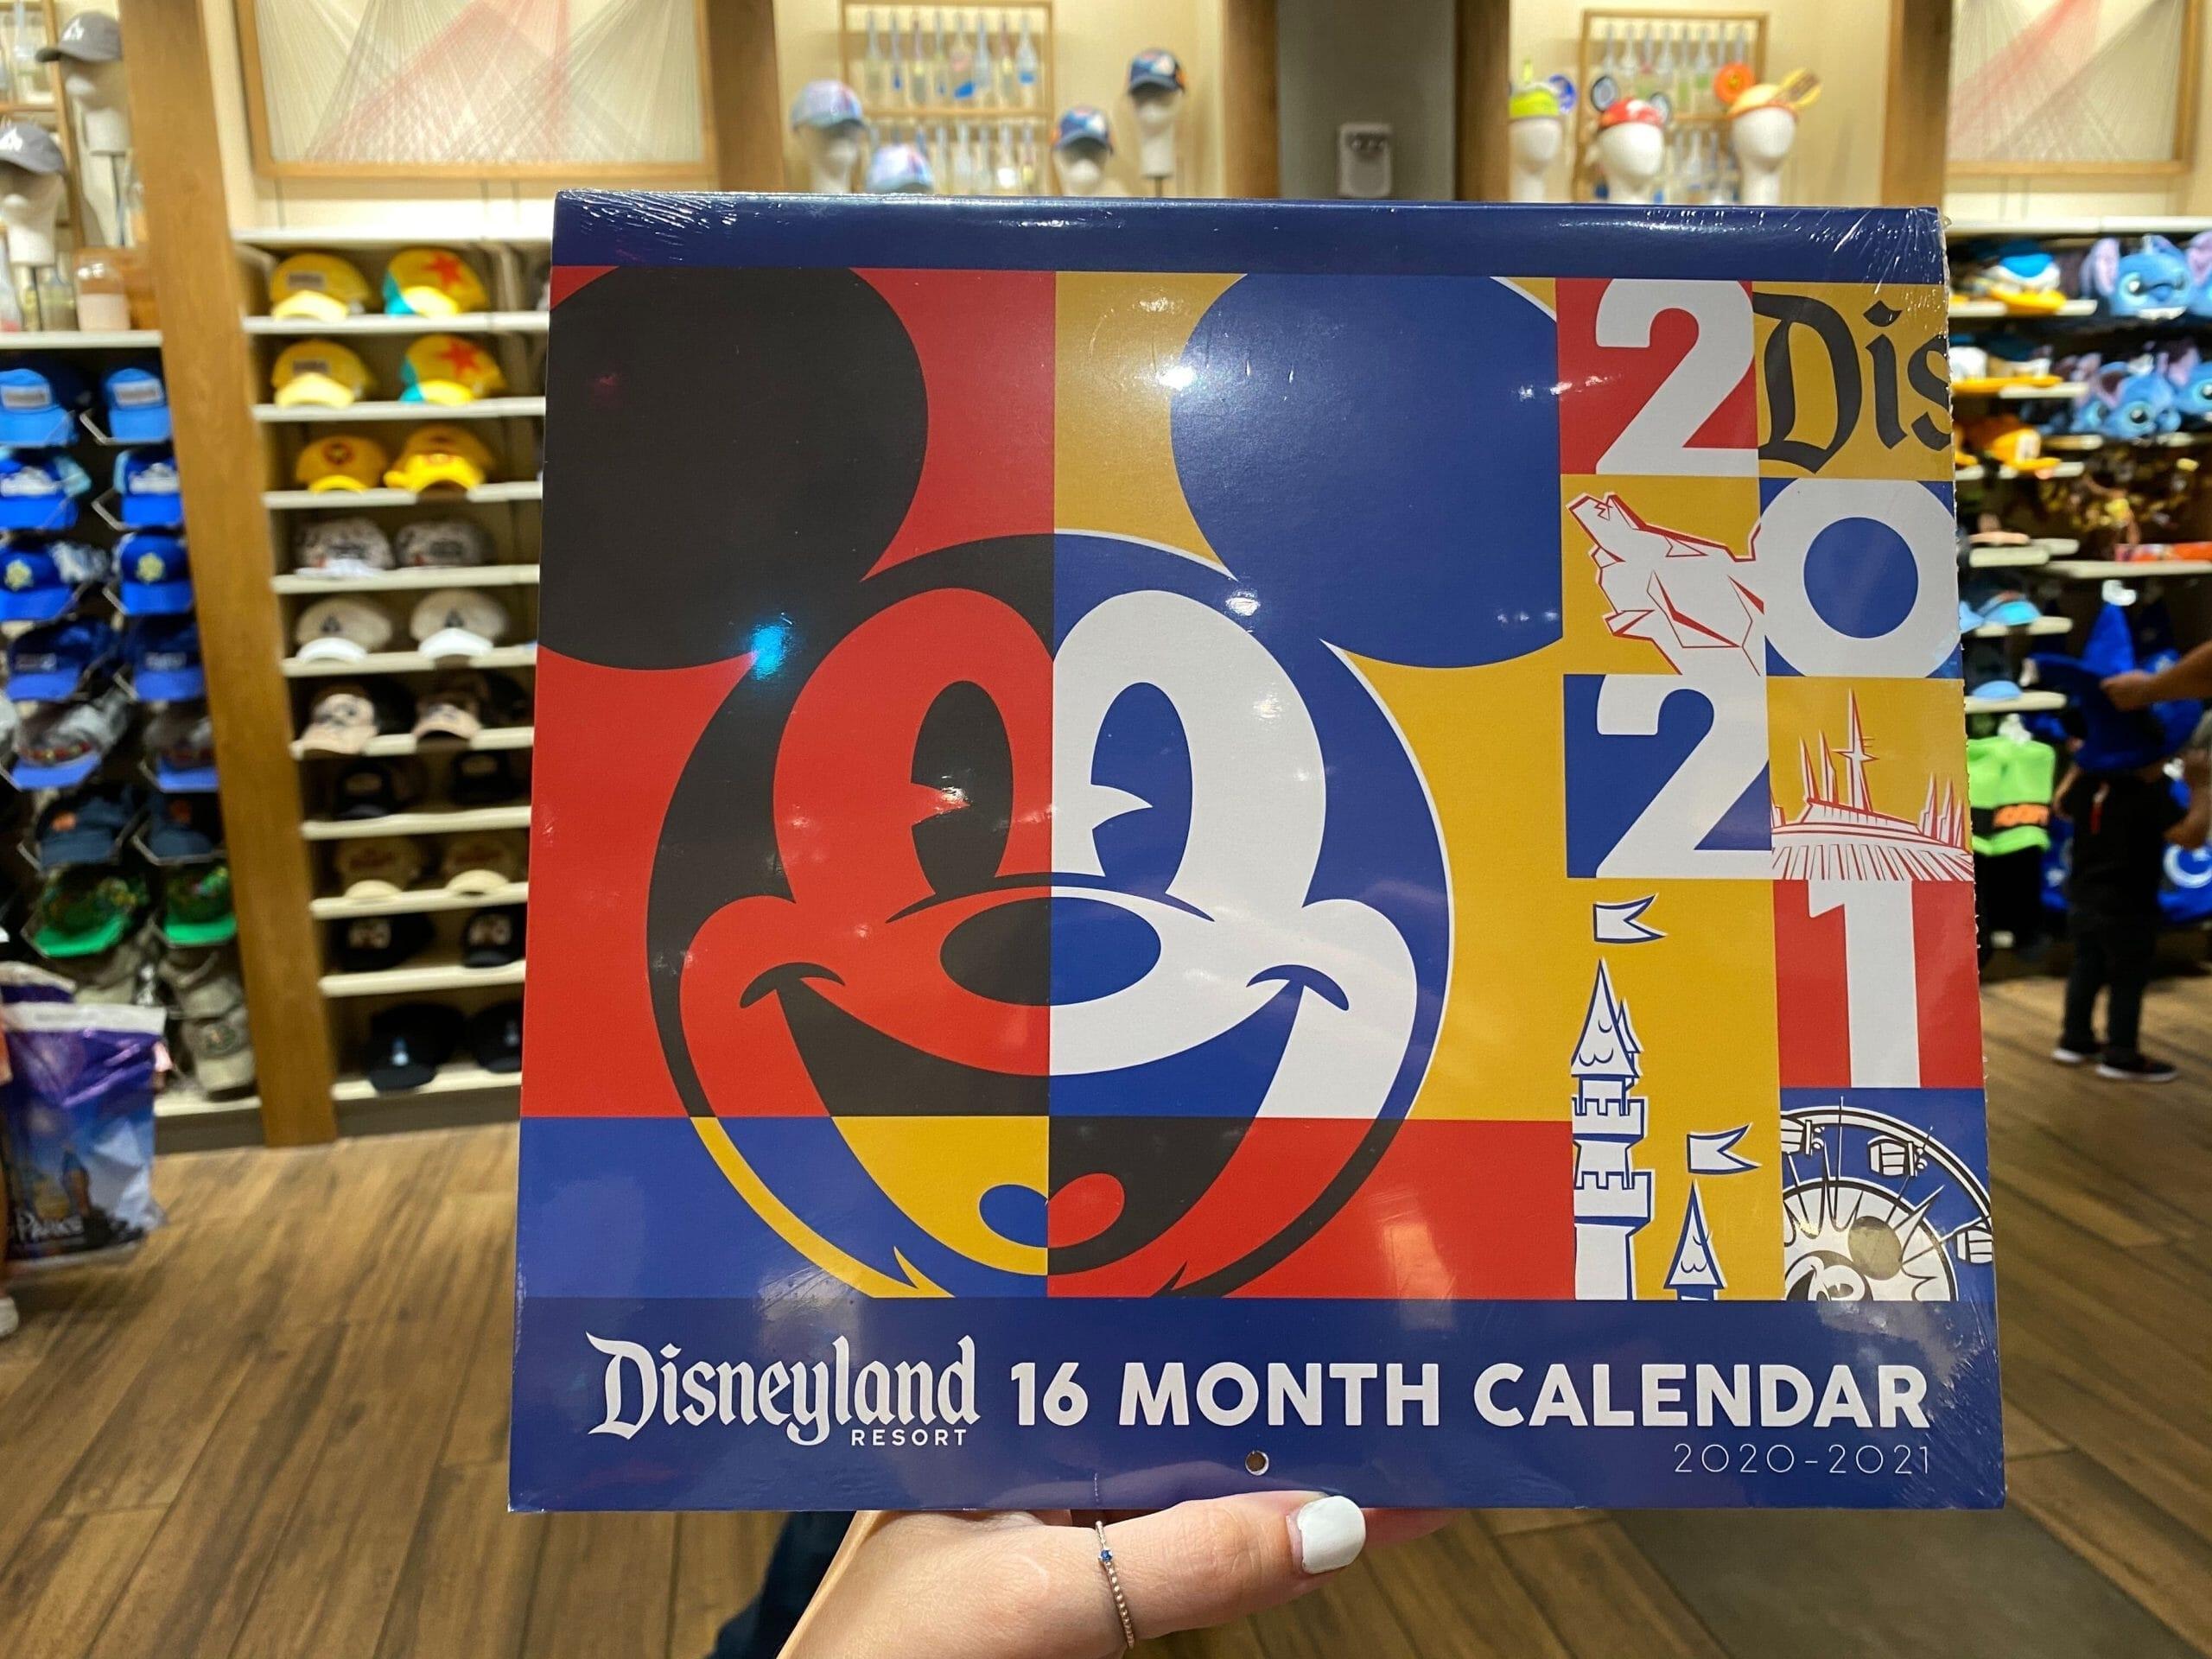 Photos: New 2021 Calendar Arrives At Disneyland Resort - Wdw